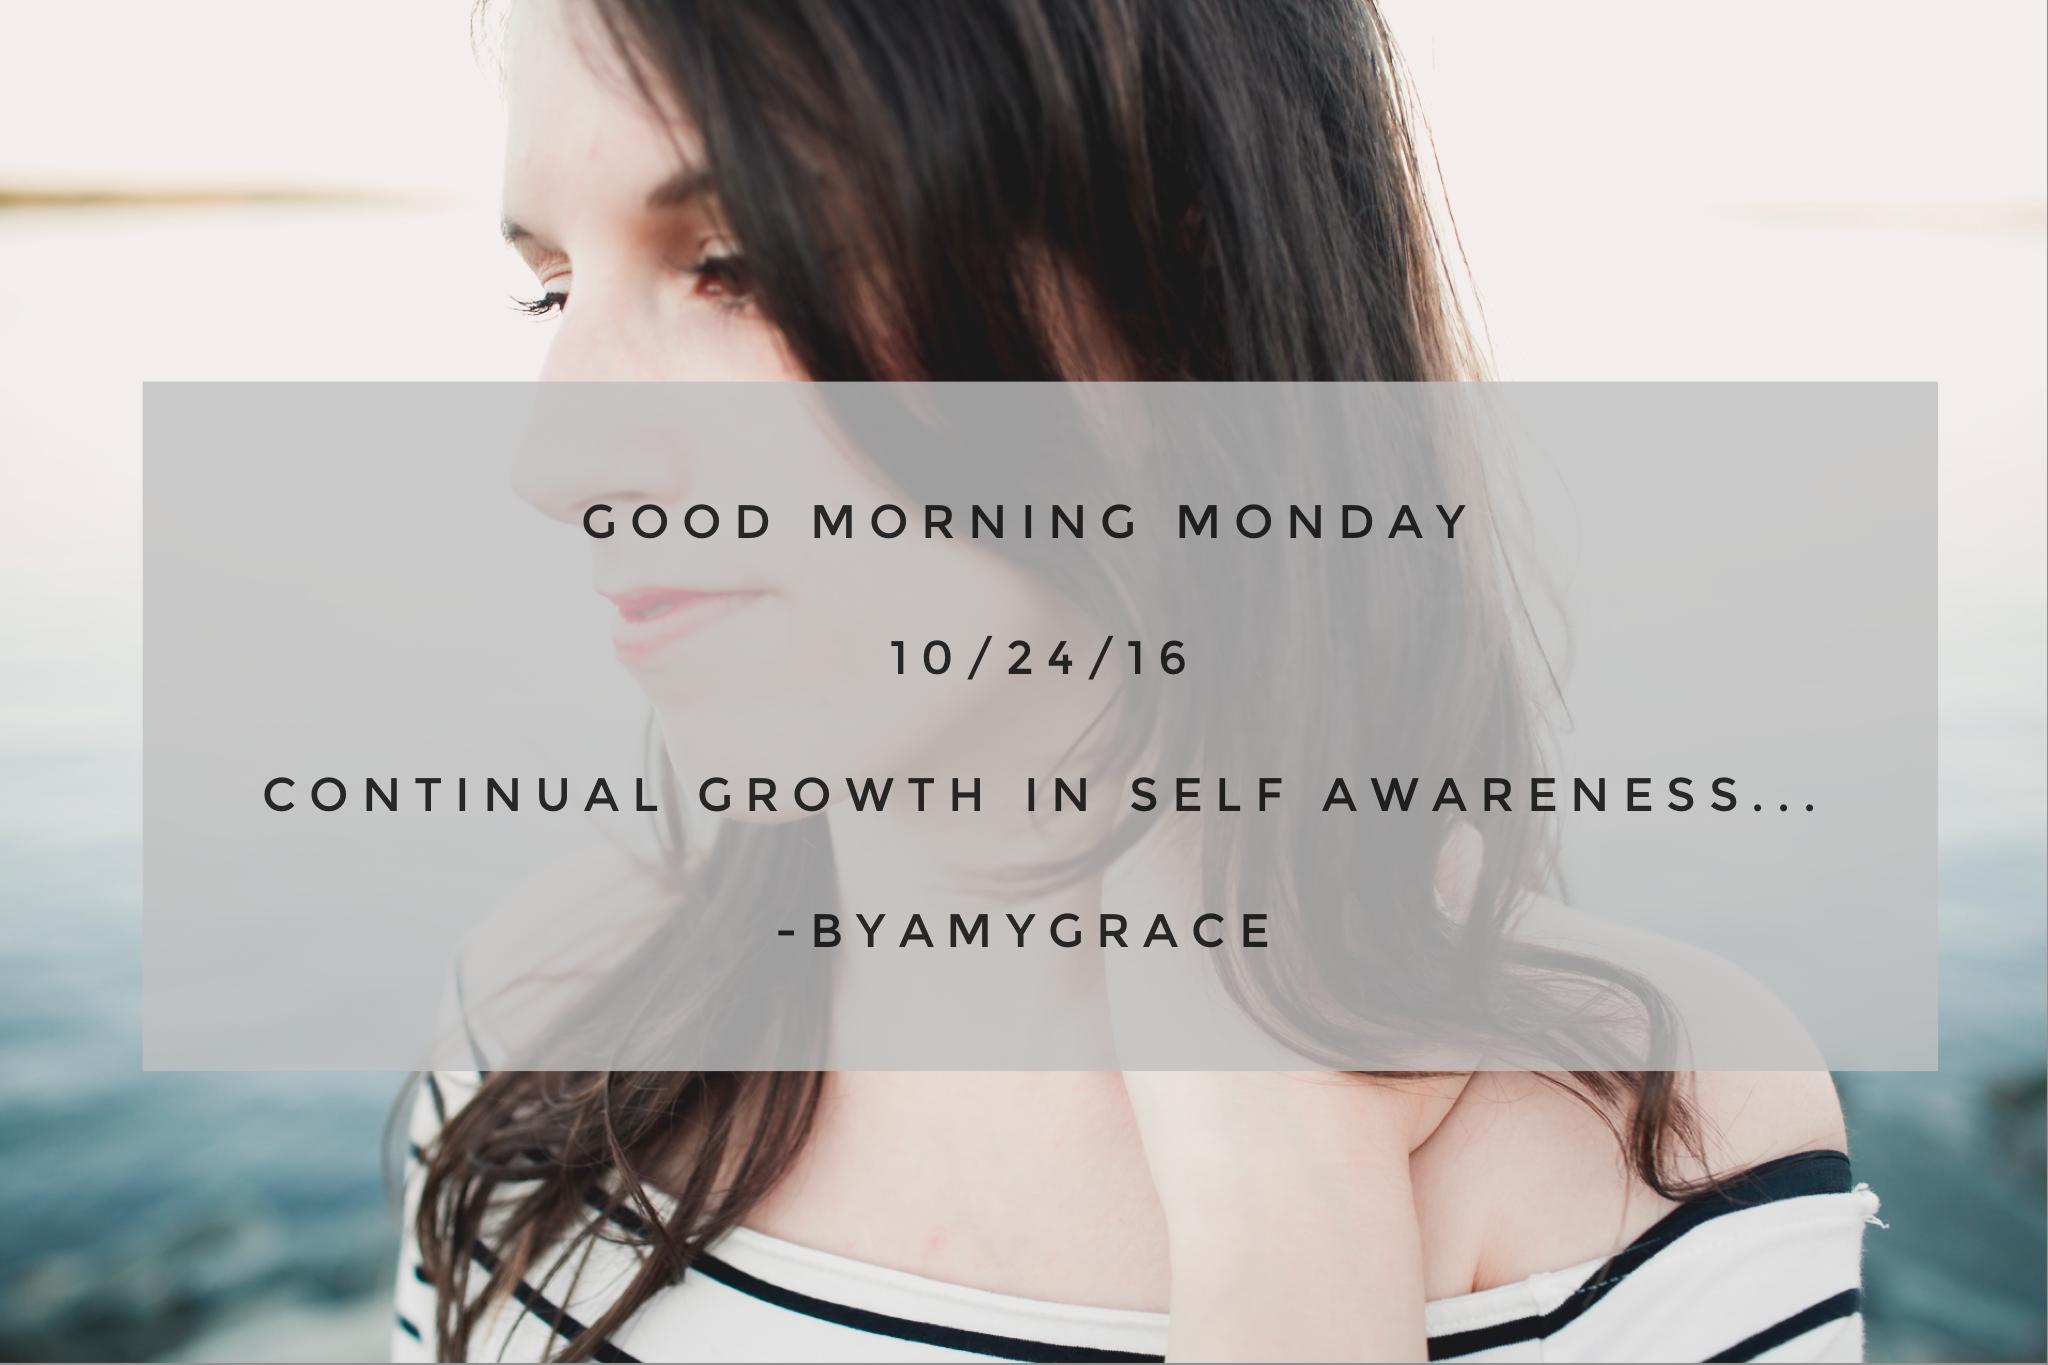 goodmorningmonday.byamygrace.10/24/16